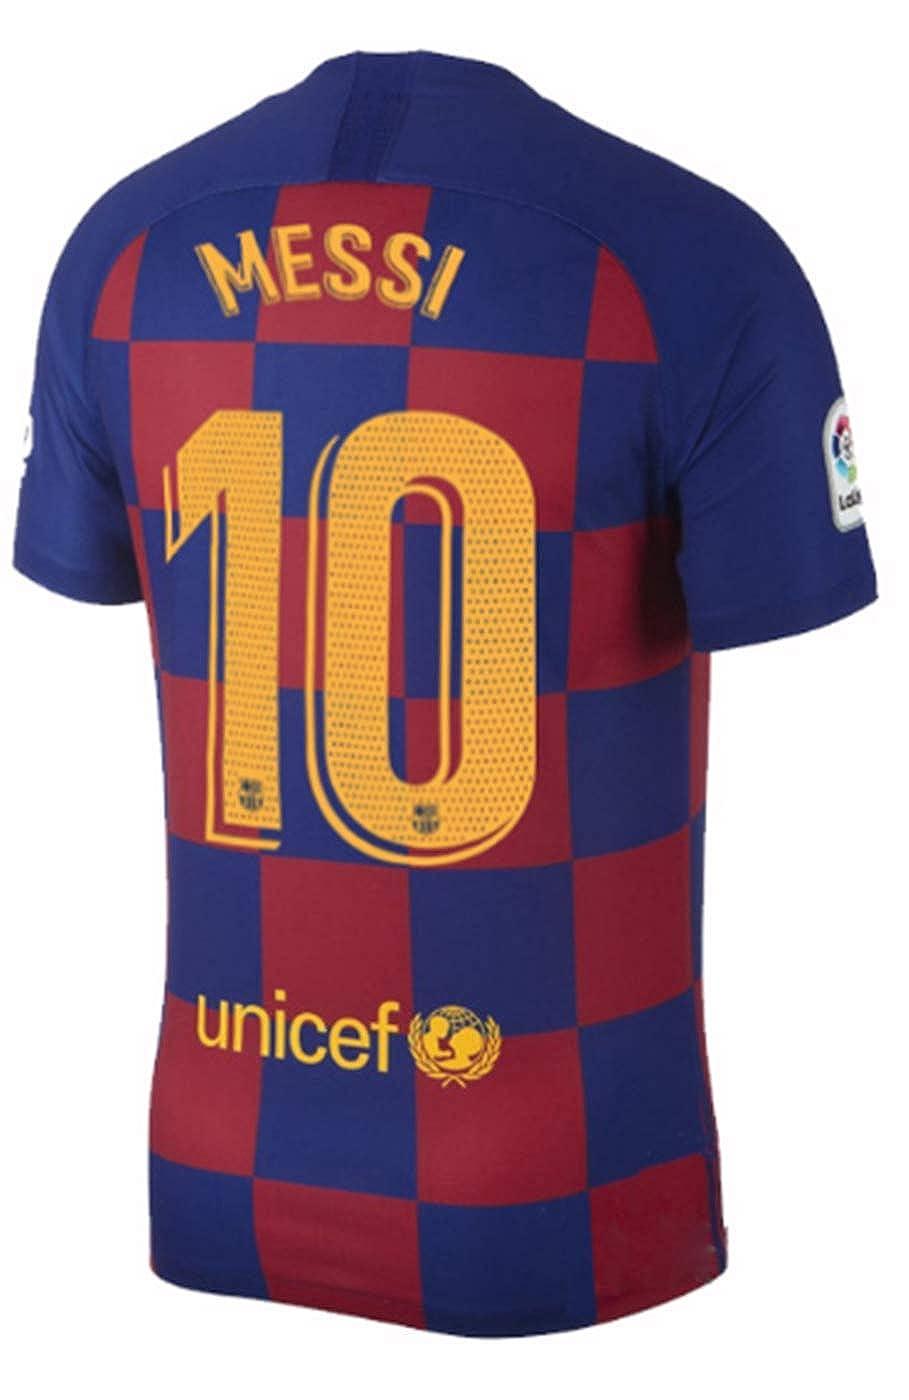 Messi # 10 Soccer Jersey 2019-2020 Season Home Mens Jersey Blue//Purple